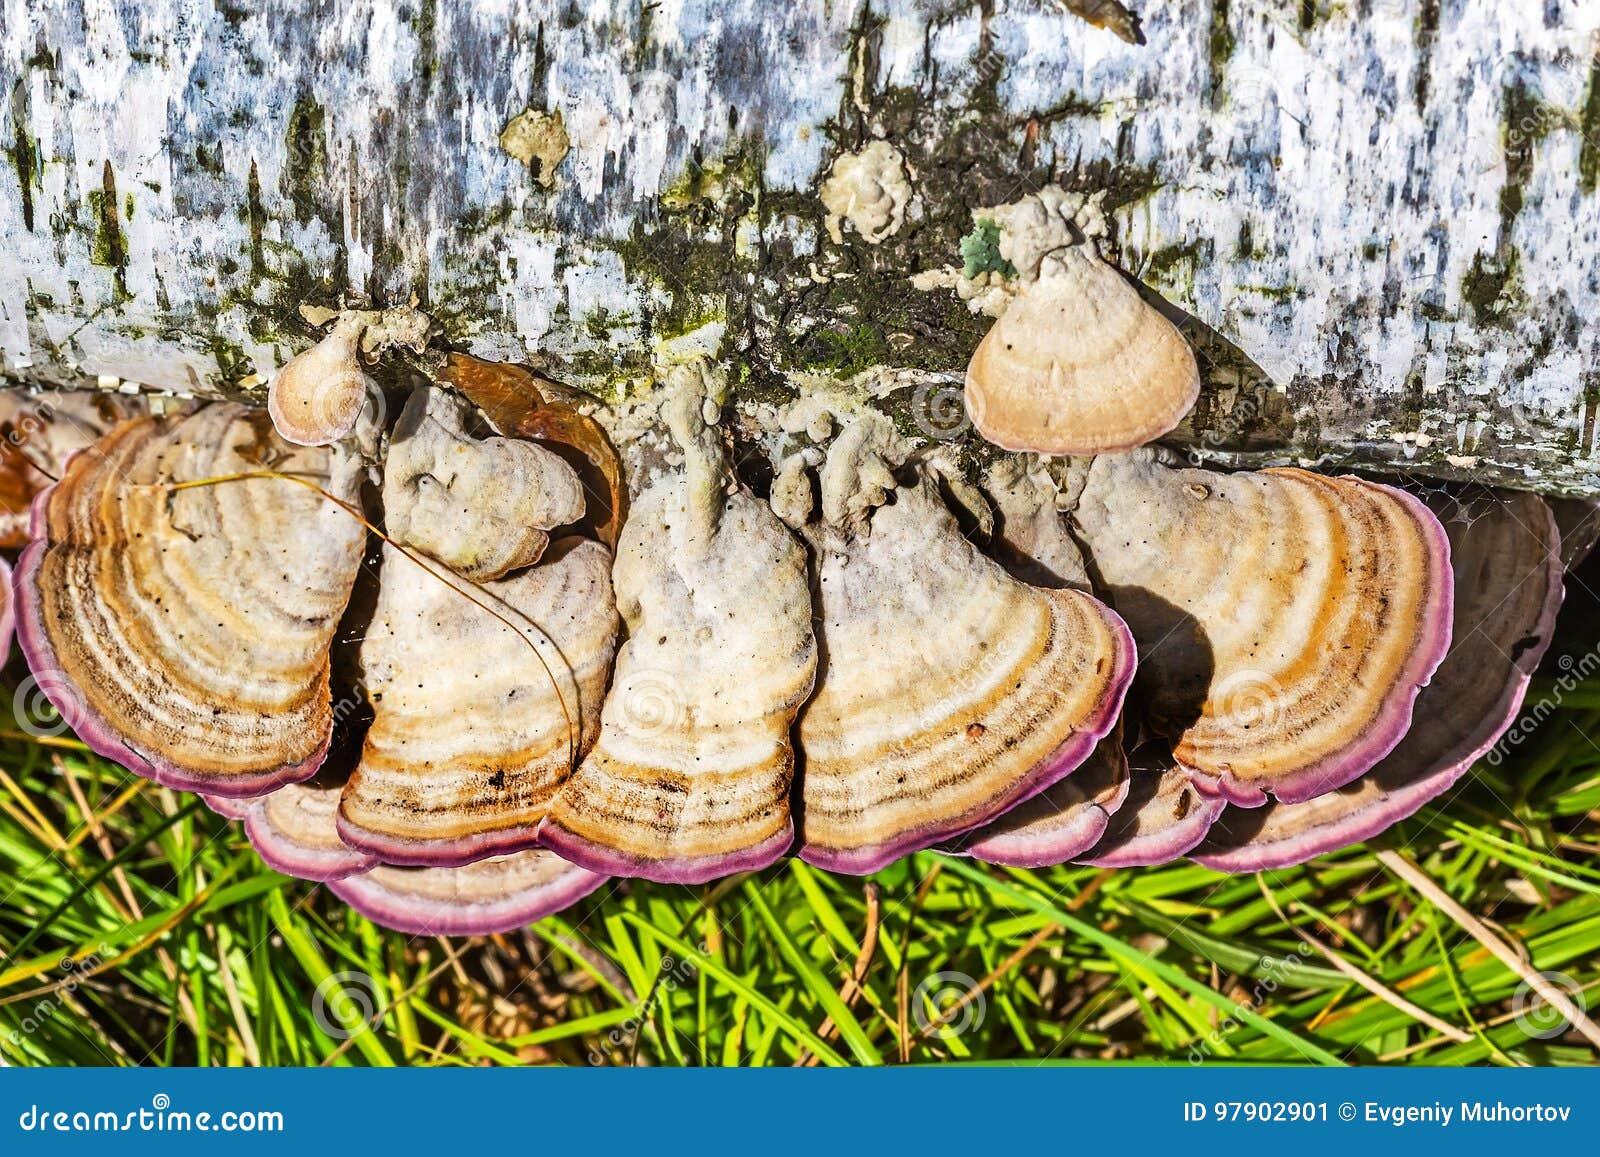 Inedible mushroom or colored Polypore Coriolus versicolor lat.